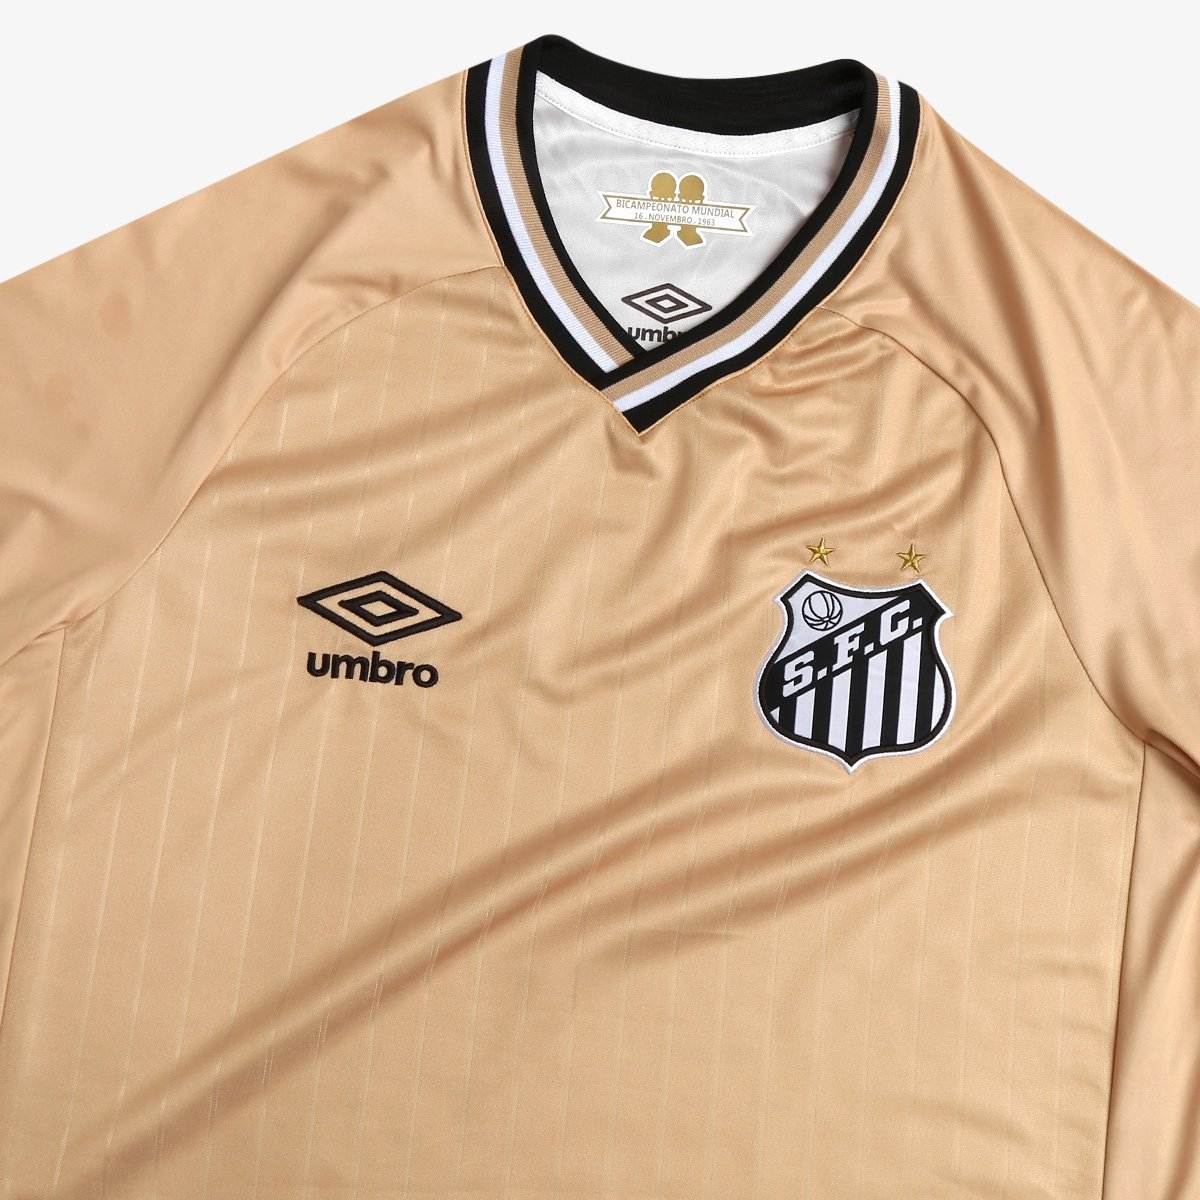 f81f117119 Camisa Santos III 2018 s n° - Torcedor Umbro Masculina - Dourado ...